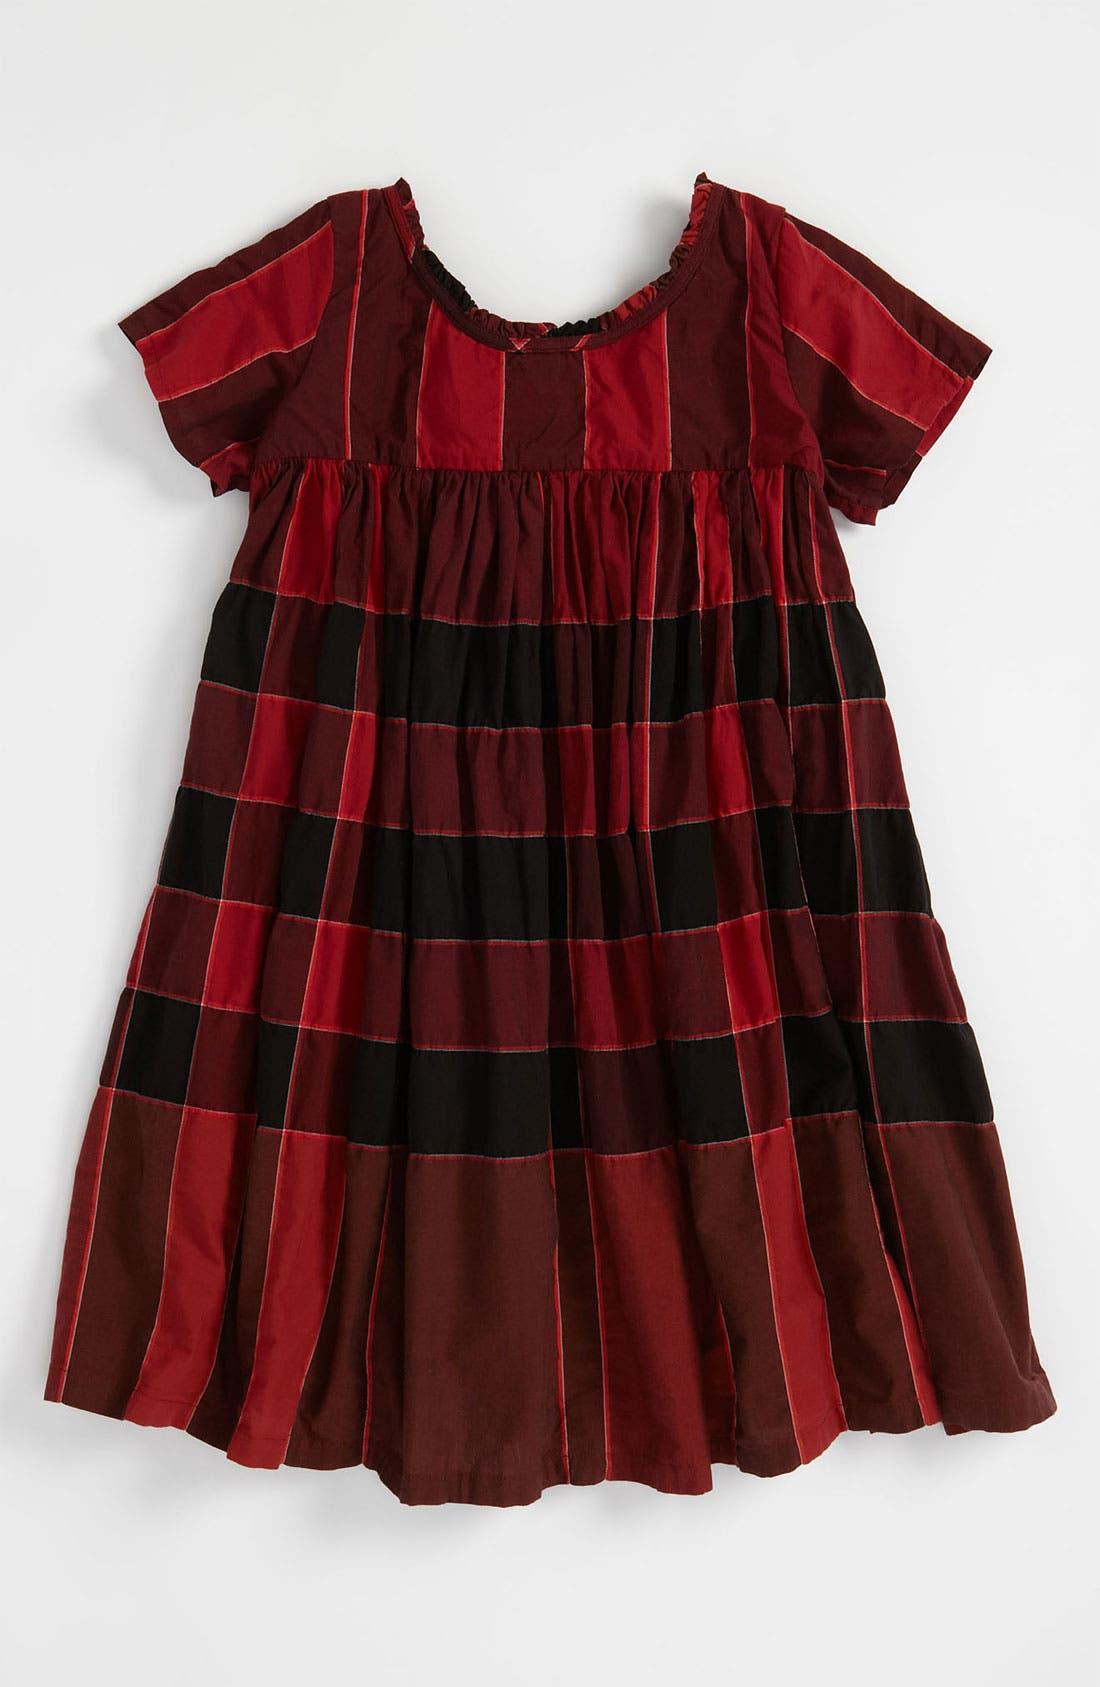 Alternate Image 1 Selected - Burberry Check Print Dress (Little Girls)